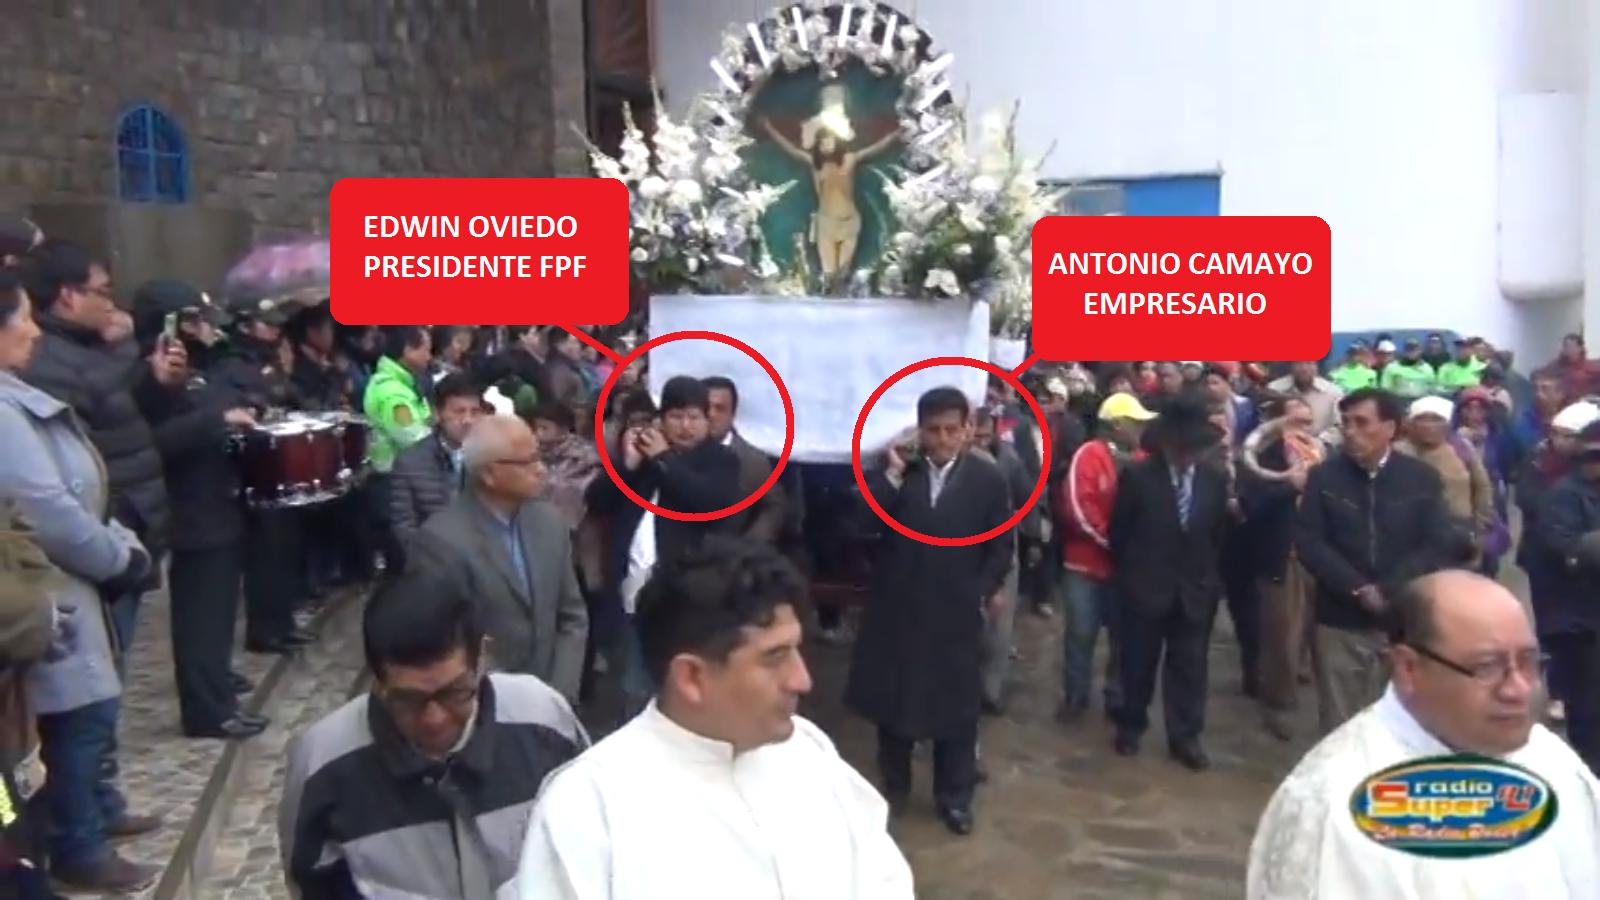 Antonio Camayo y Edwin Oviedo